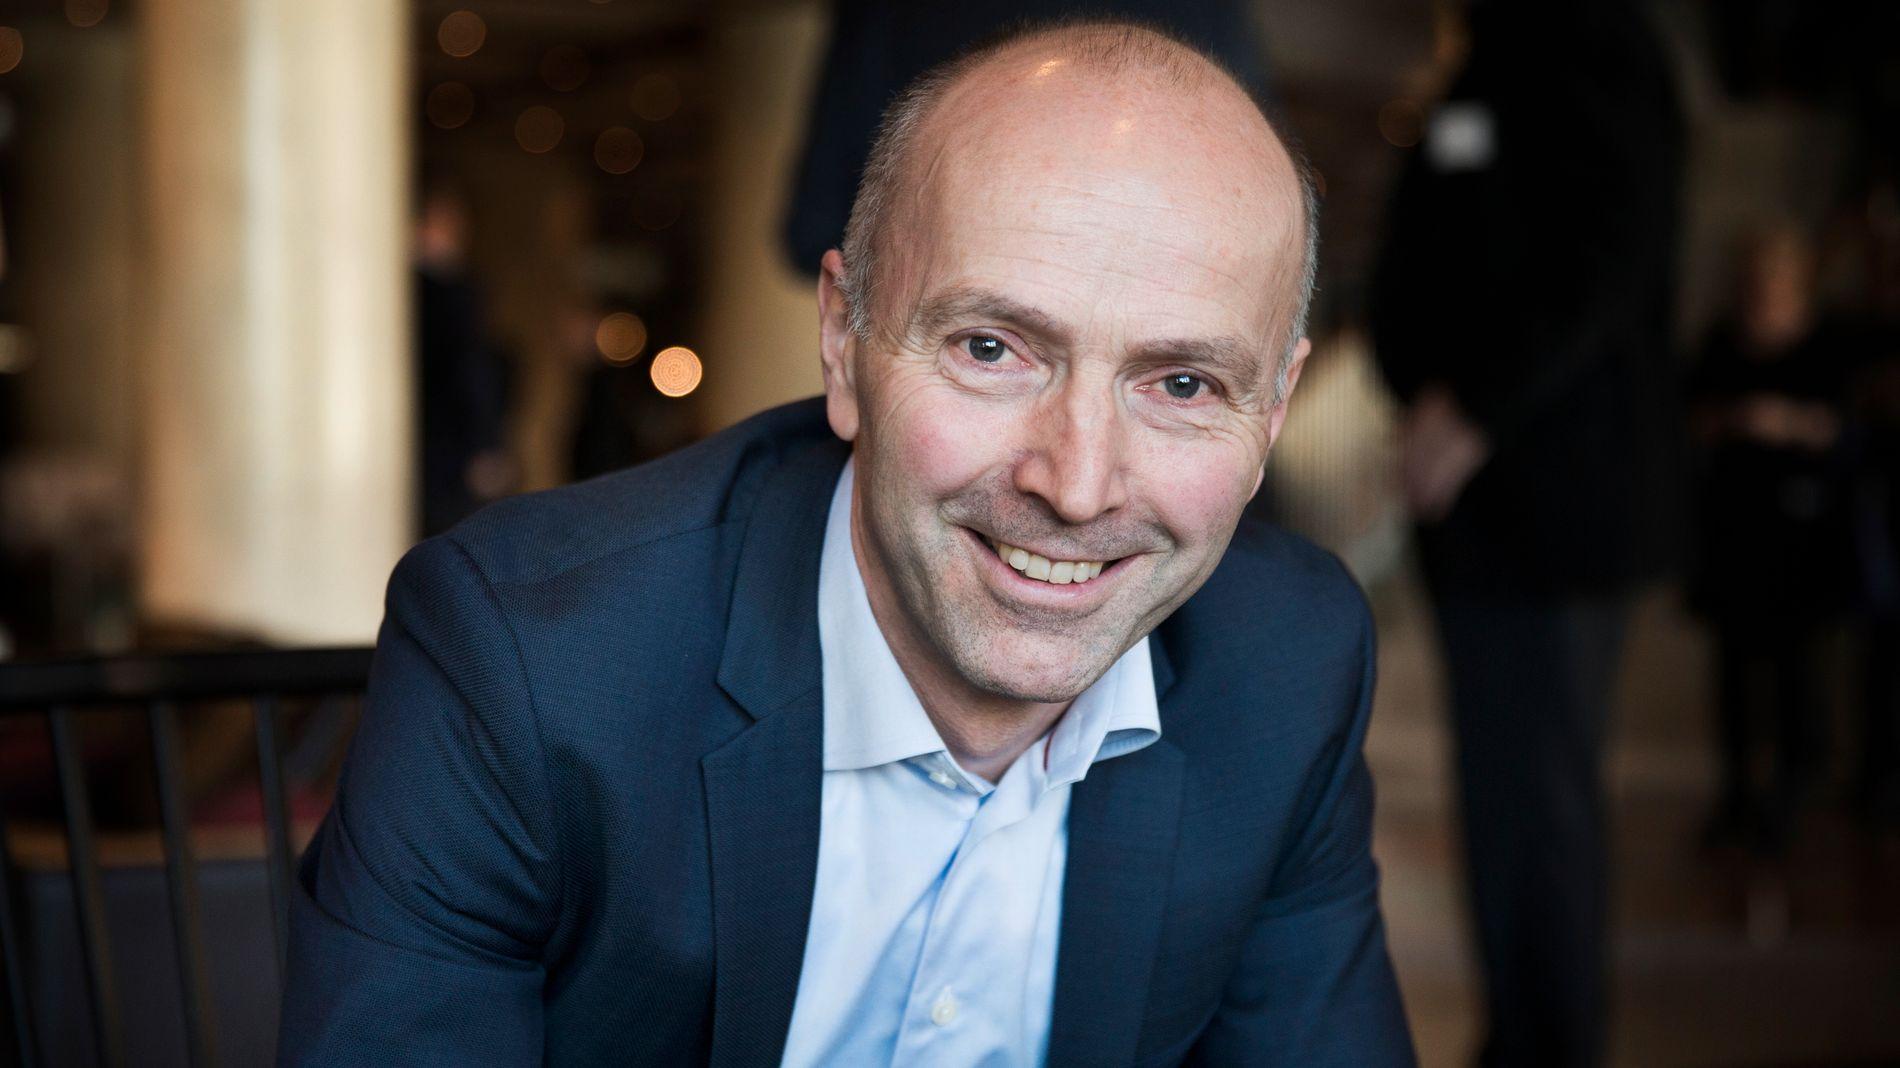 KUTTER RENTEN: Administrerende direktør i BN Bank, Gunnar Hovland.